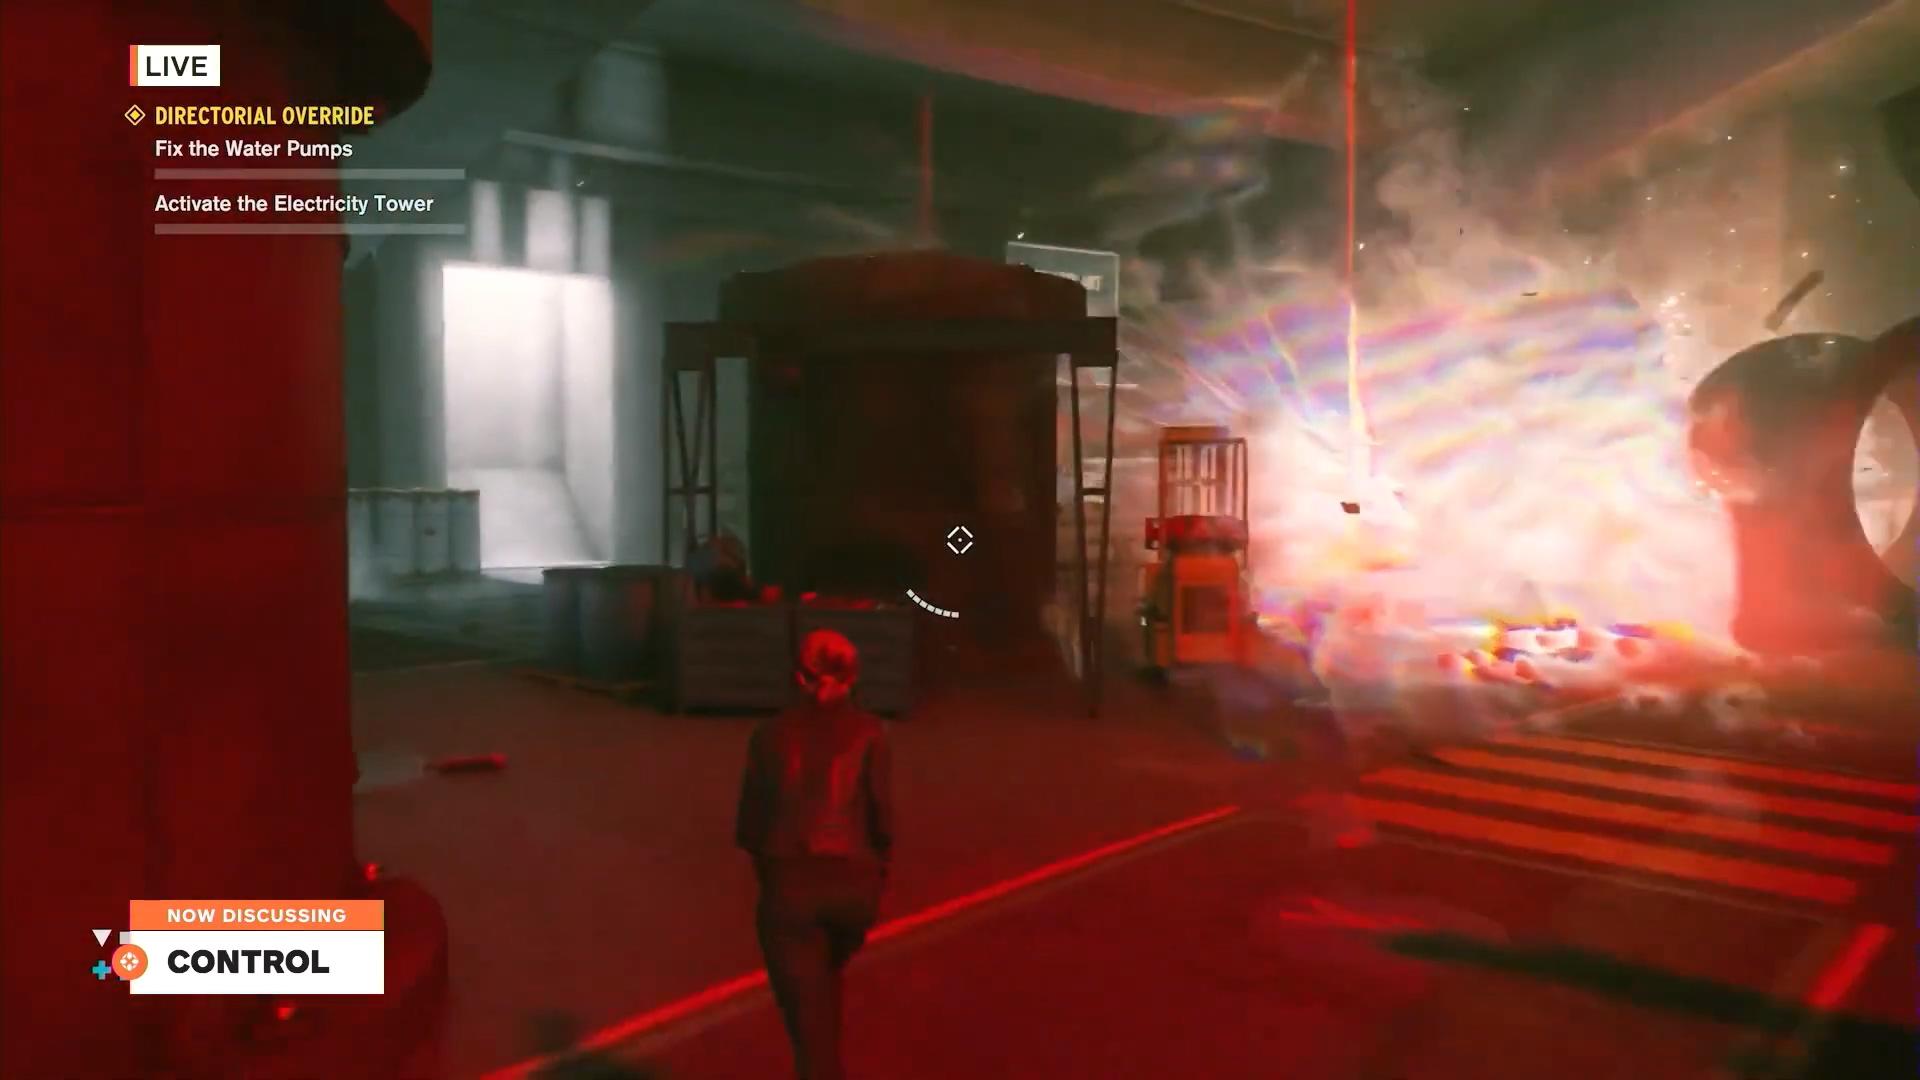 《Control》游戏截图